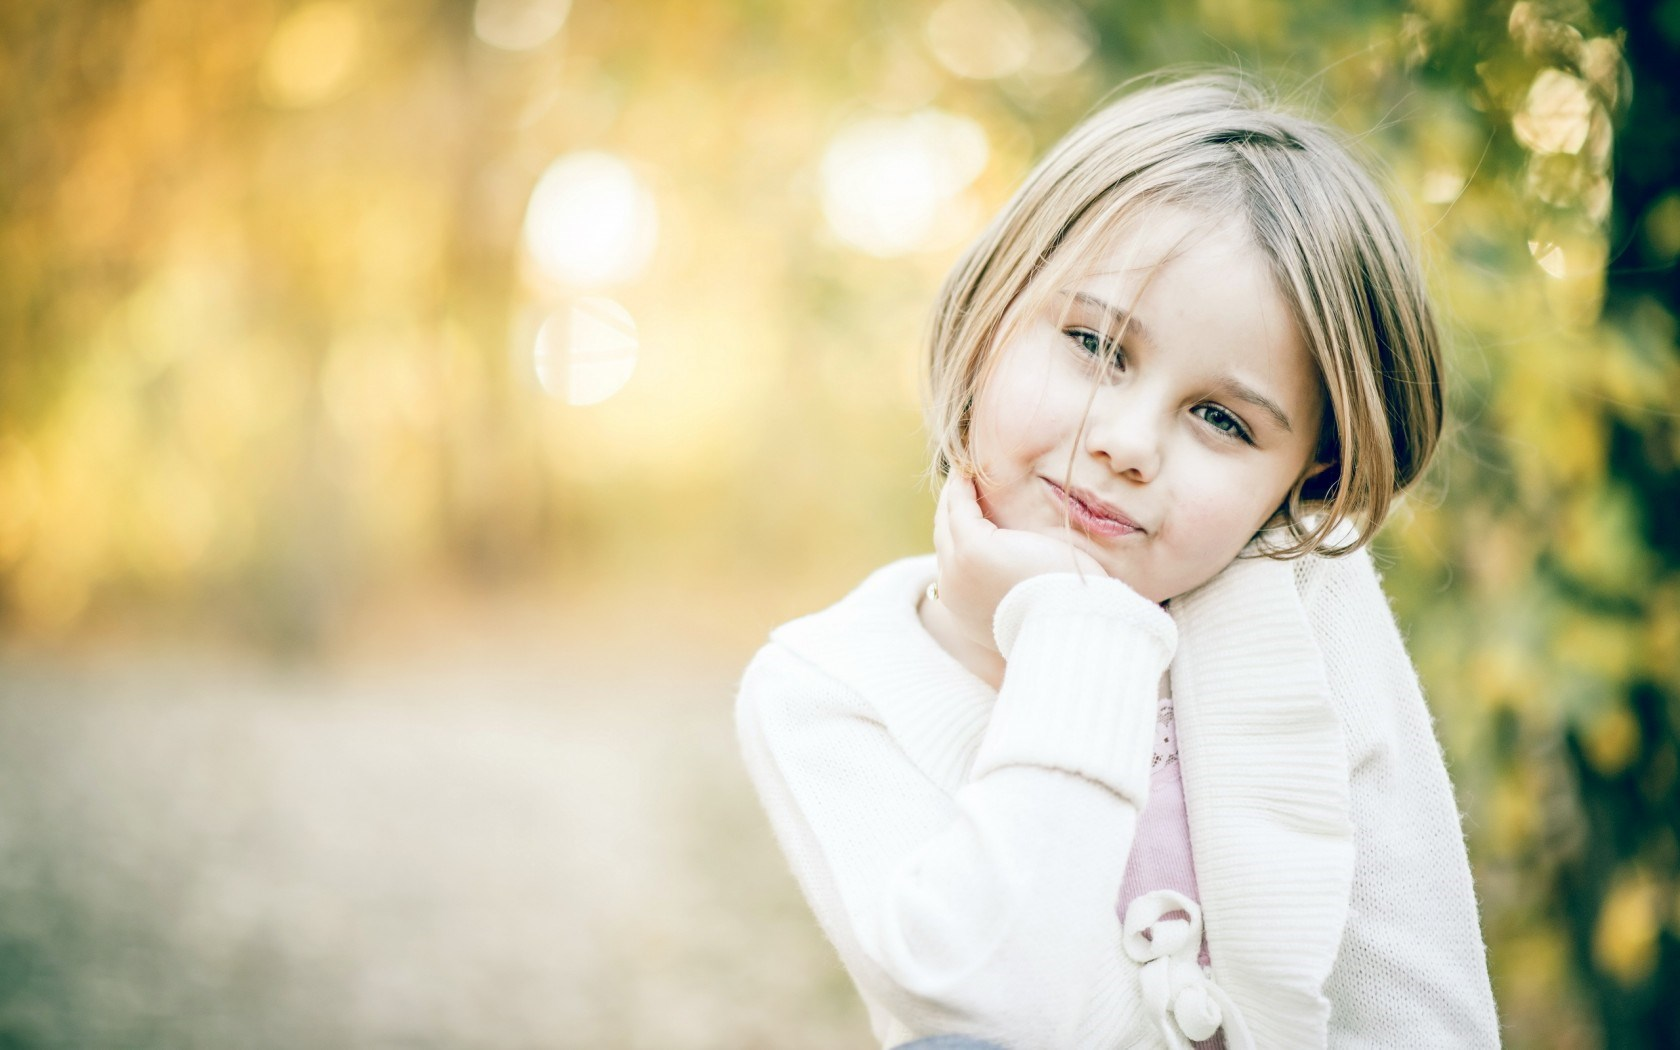 Beautiful Kid Girl HD Wallpaper   StylishHDWallpapers 1680x1050